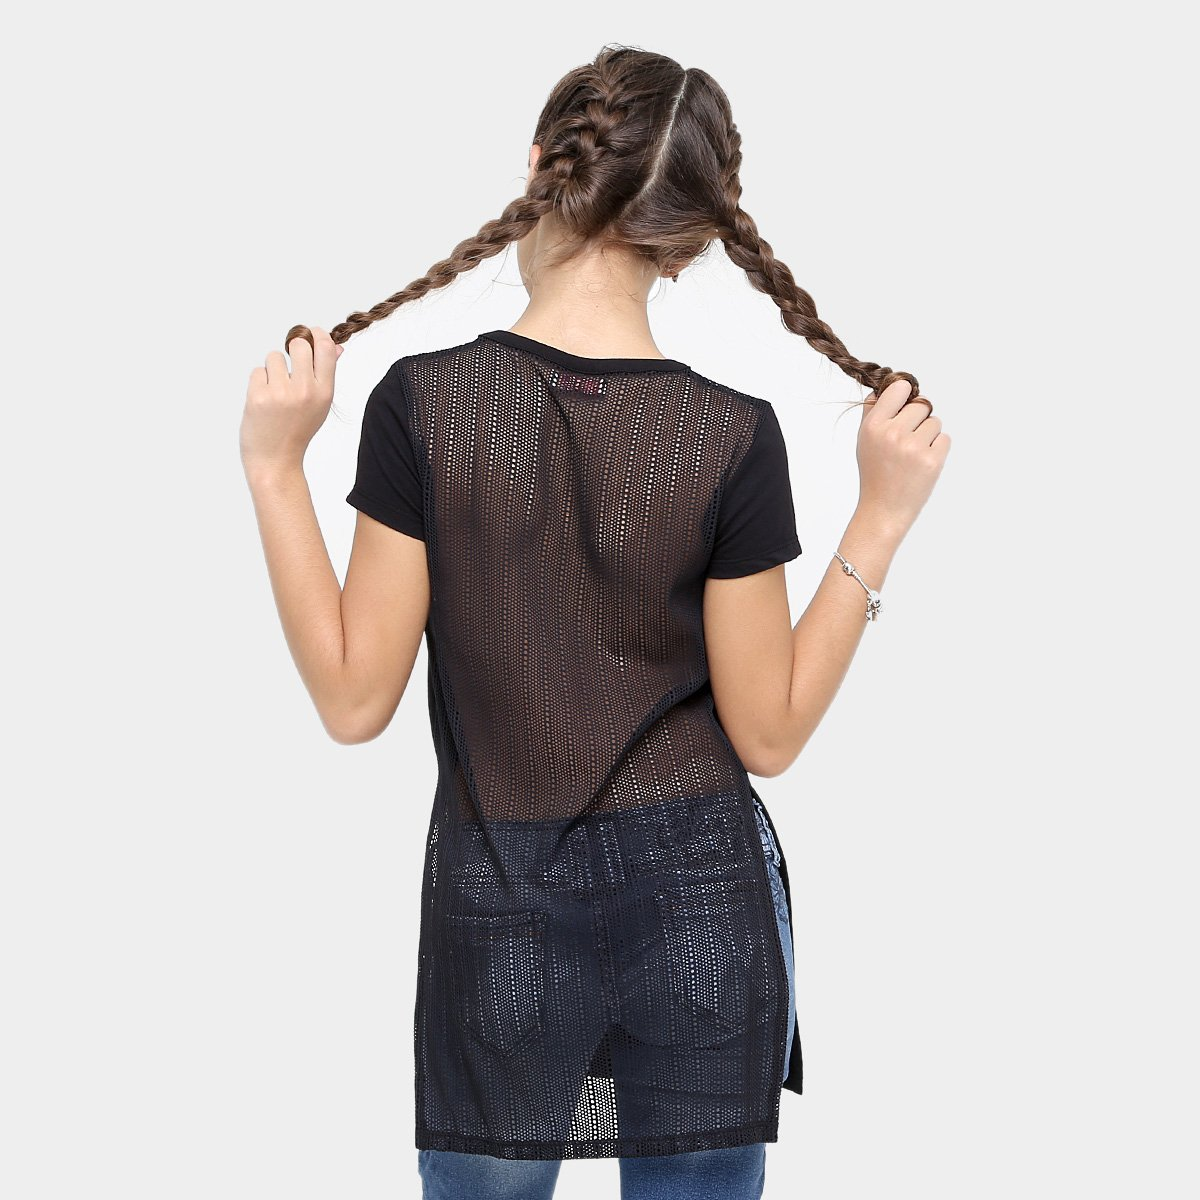 Camiseta Camiseta Preto Infantil Fun Feminina Colcci Infantil Colcci Estampada qFxwEHPRx